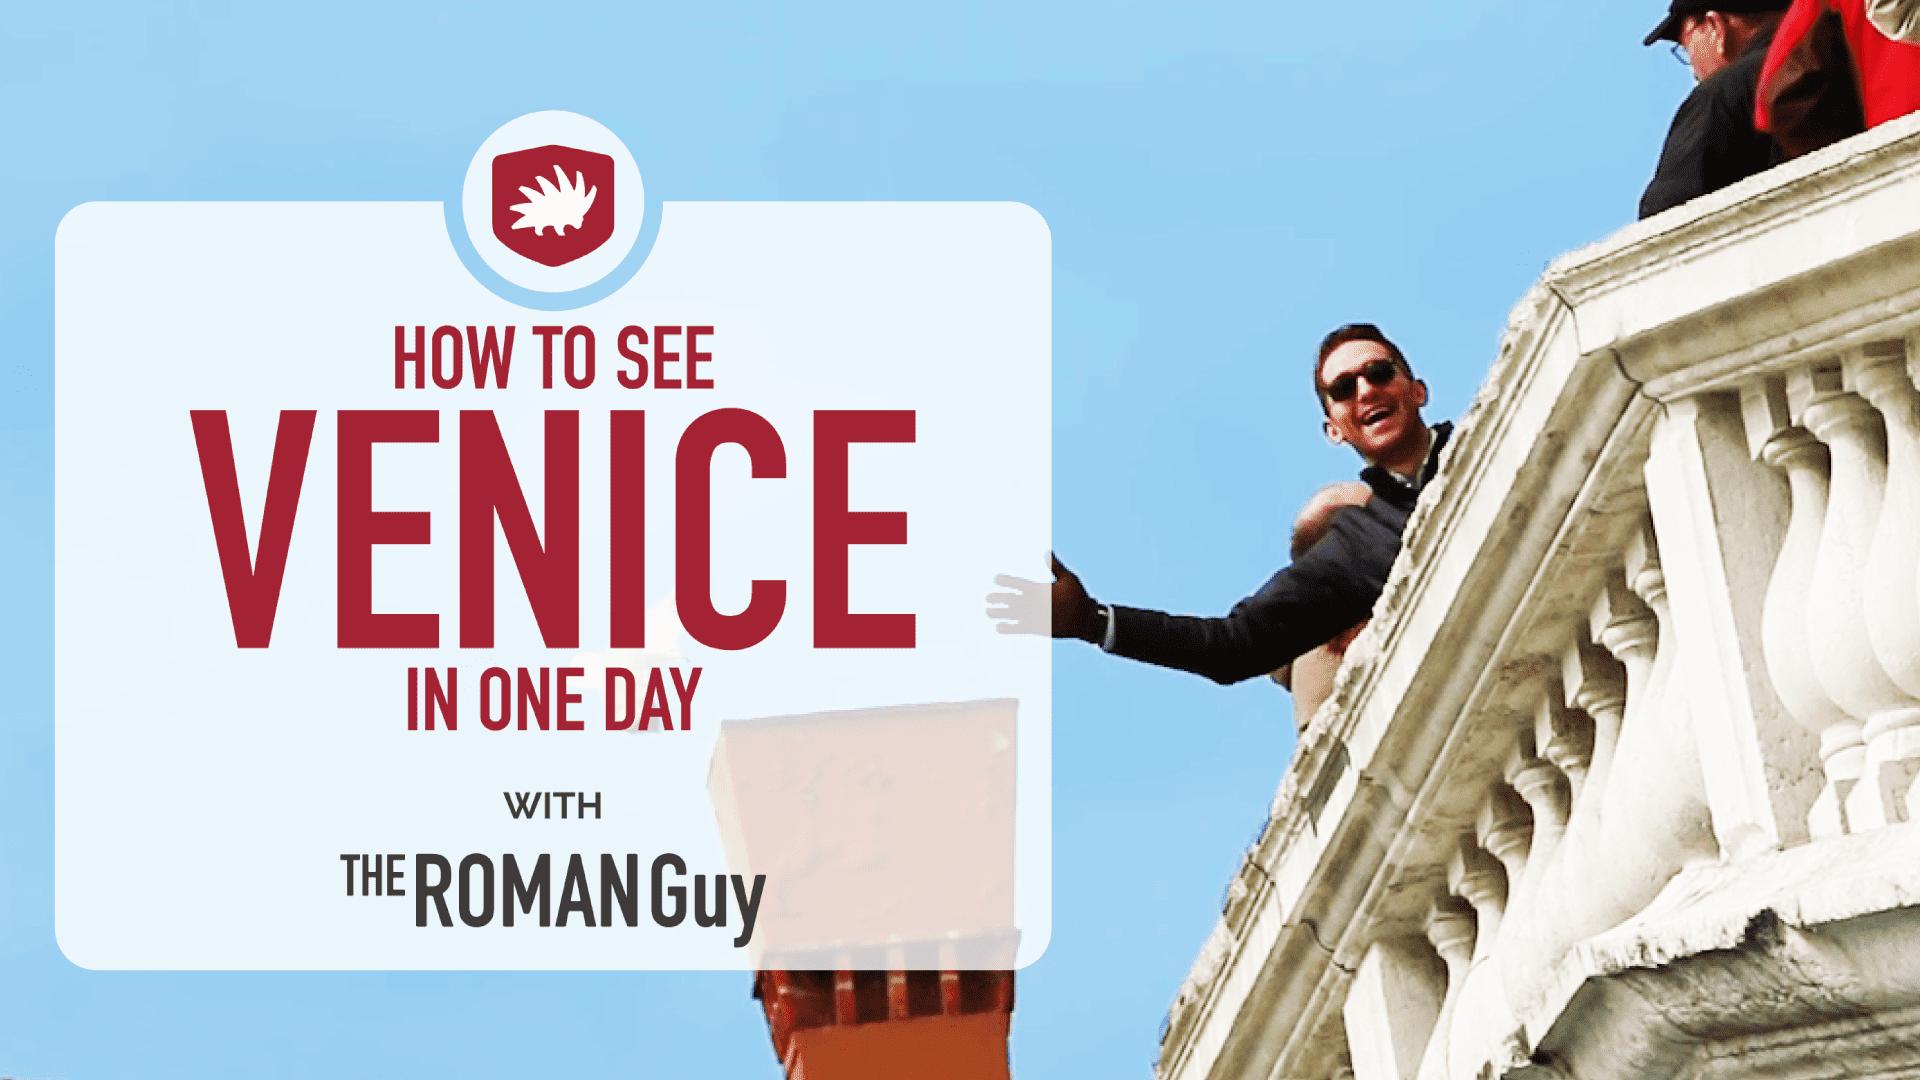 Venice Hidden Gems and Top Attractions